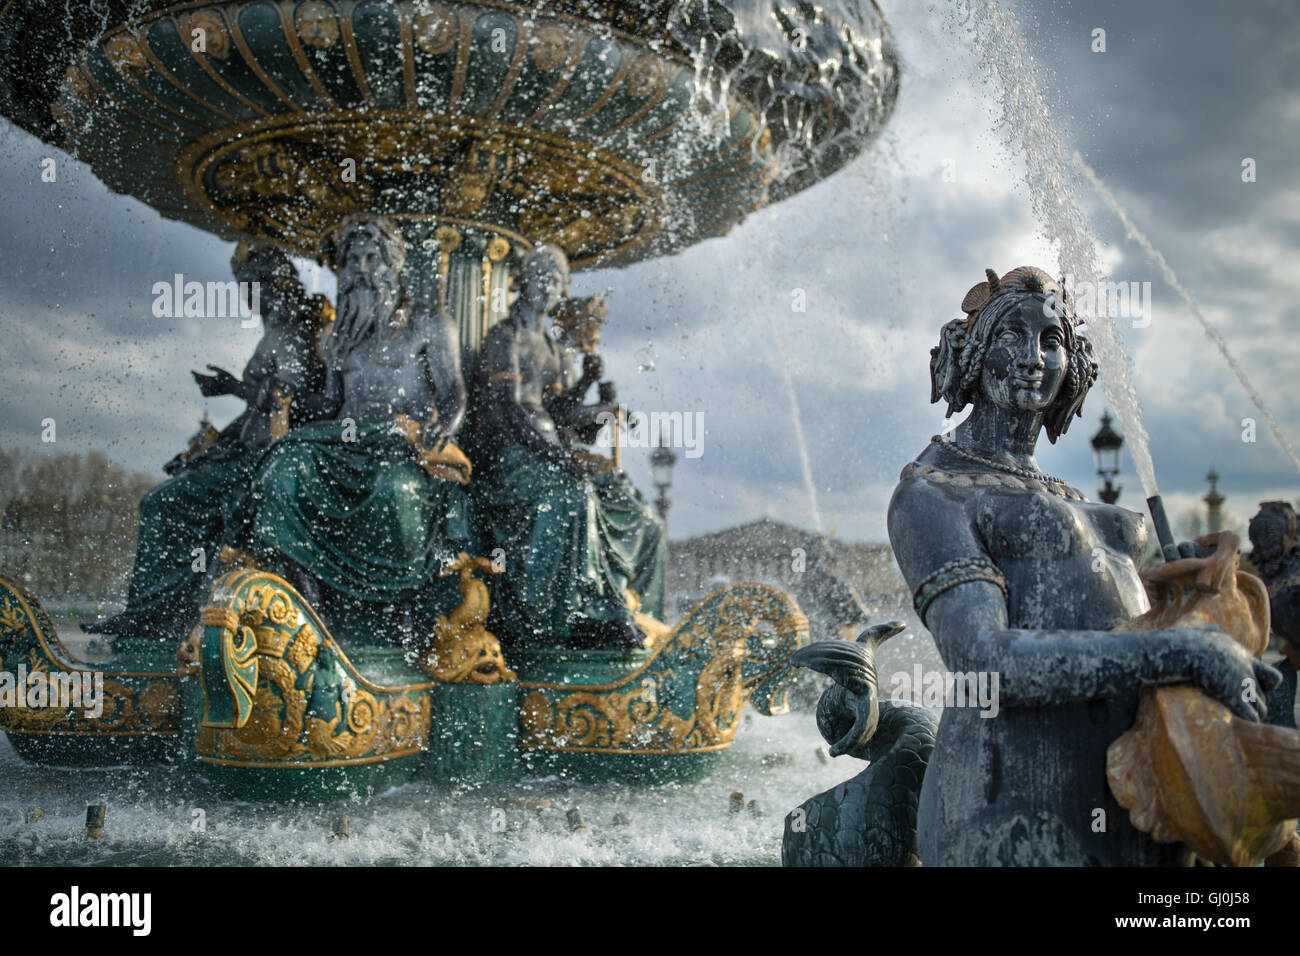 die Brunnen in der Place De La Concorde, Paris, Frankreich Stockbild